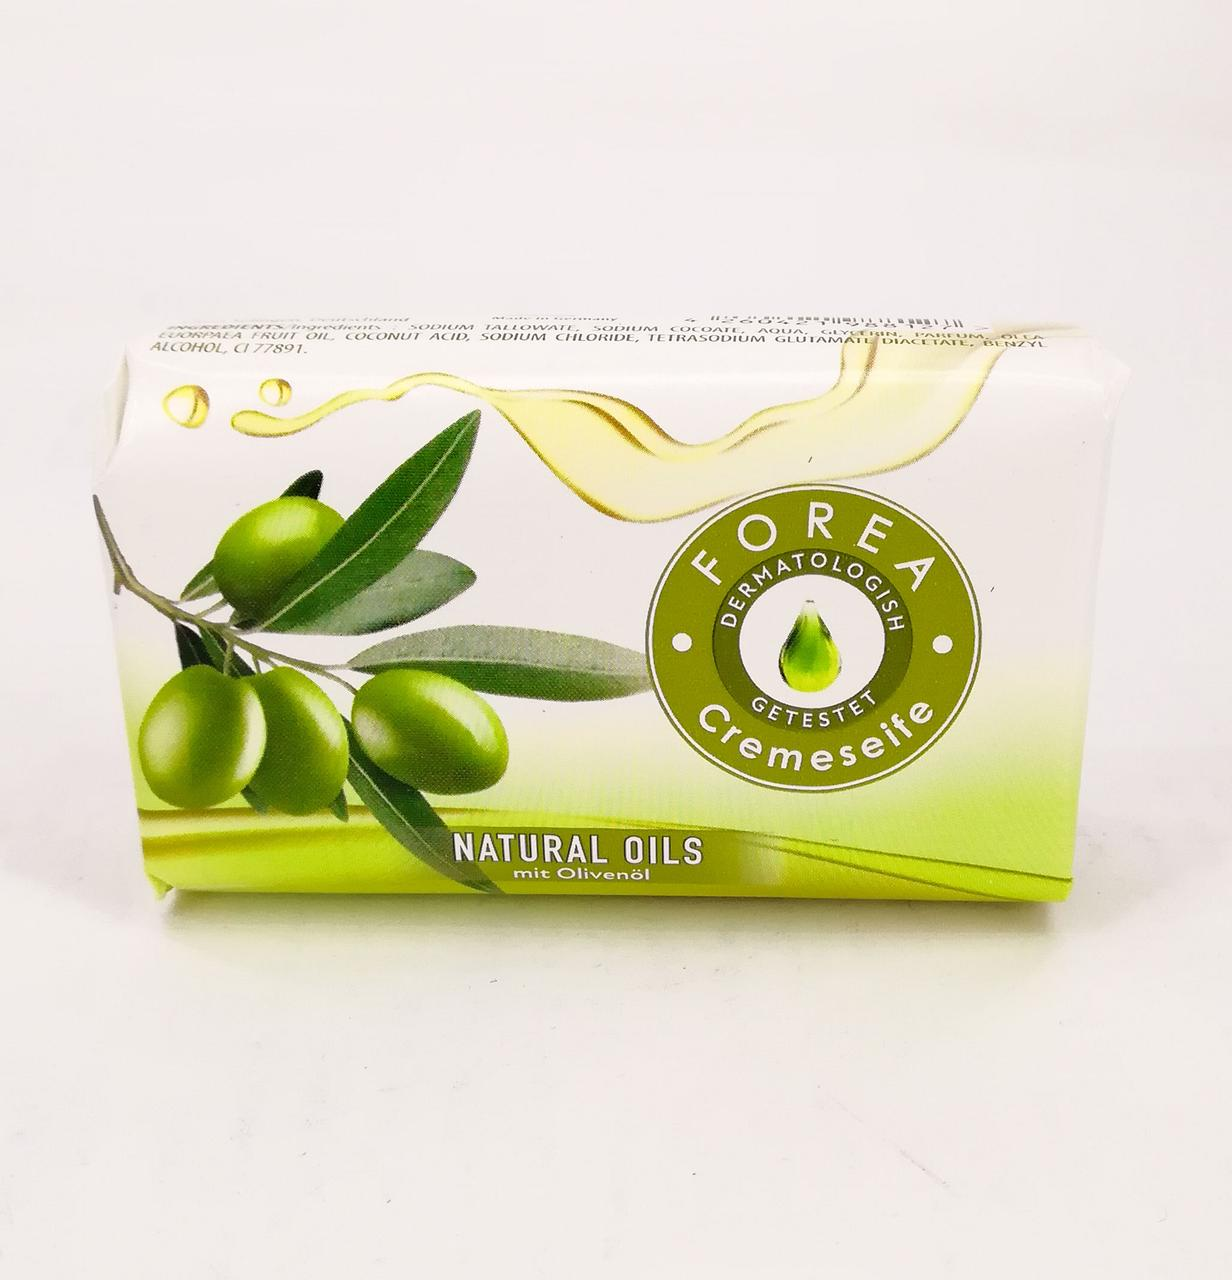 Forea Naturals Olive Soap кусковое мыло Натуральные оливки